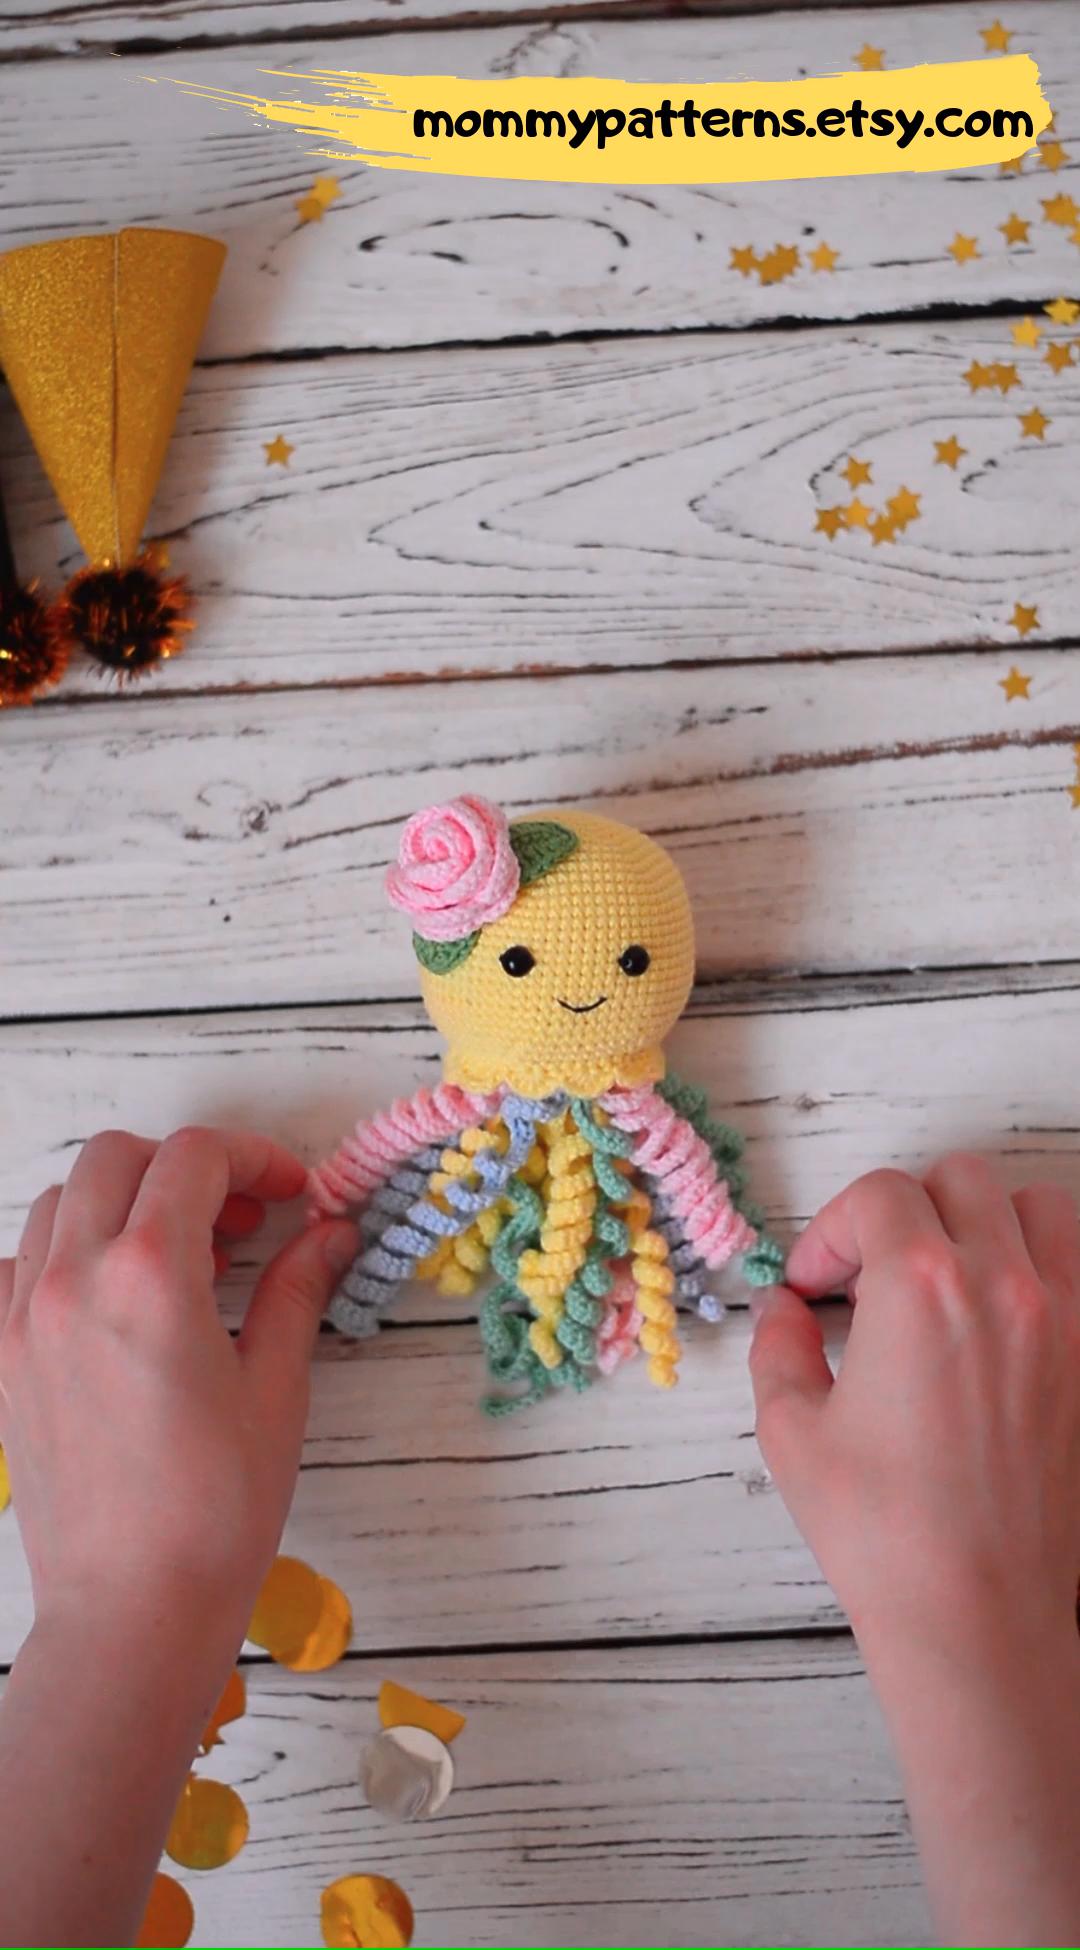 Octopus Amigurumi Crochet Tutorial - YouTube | 1950x1080